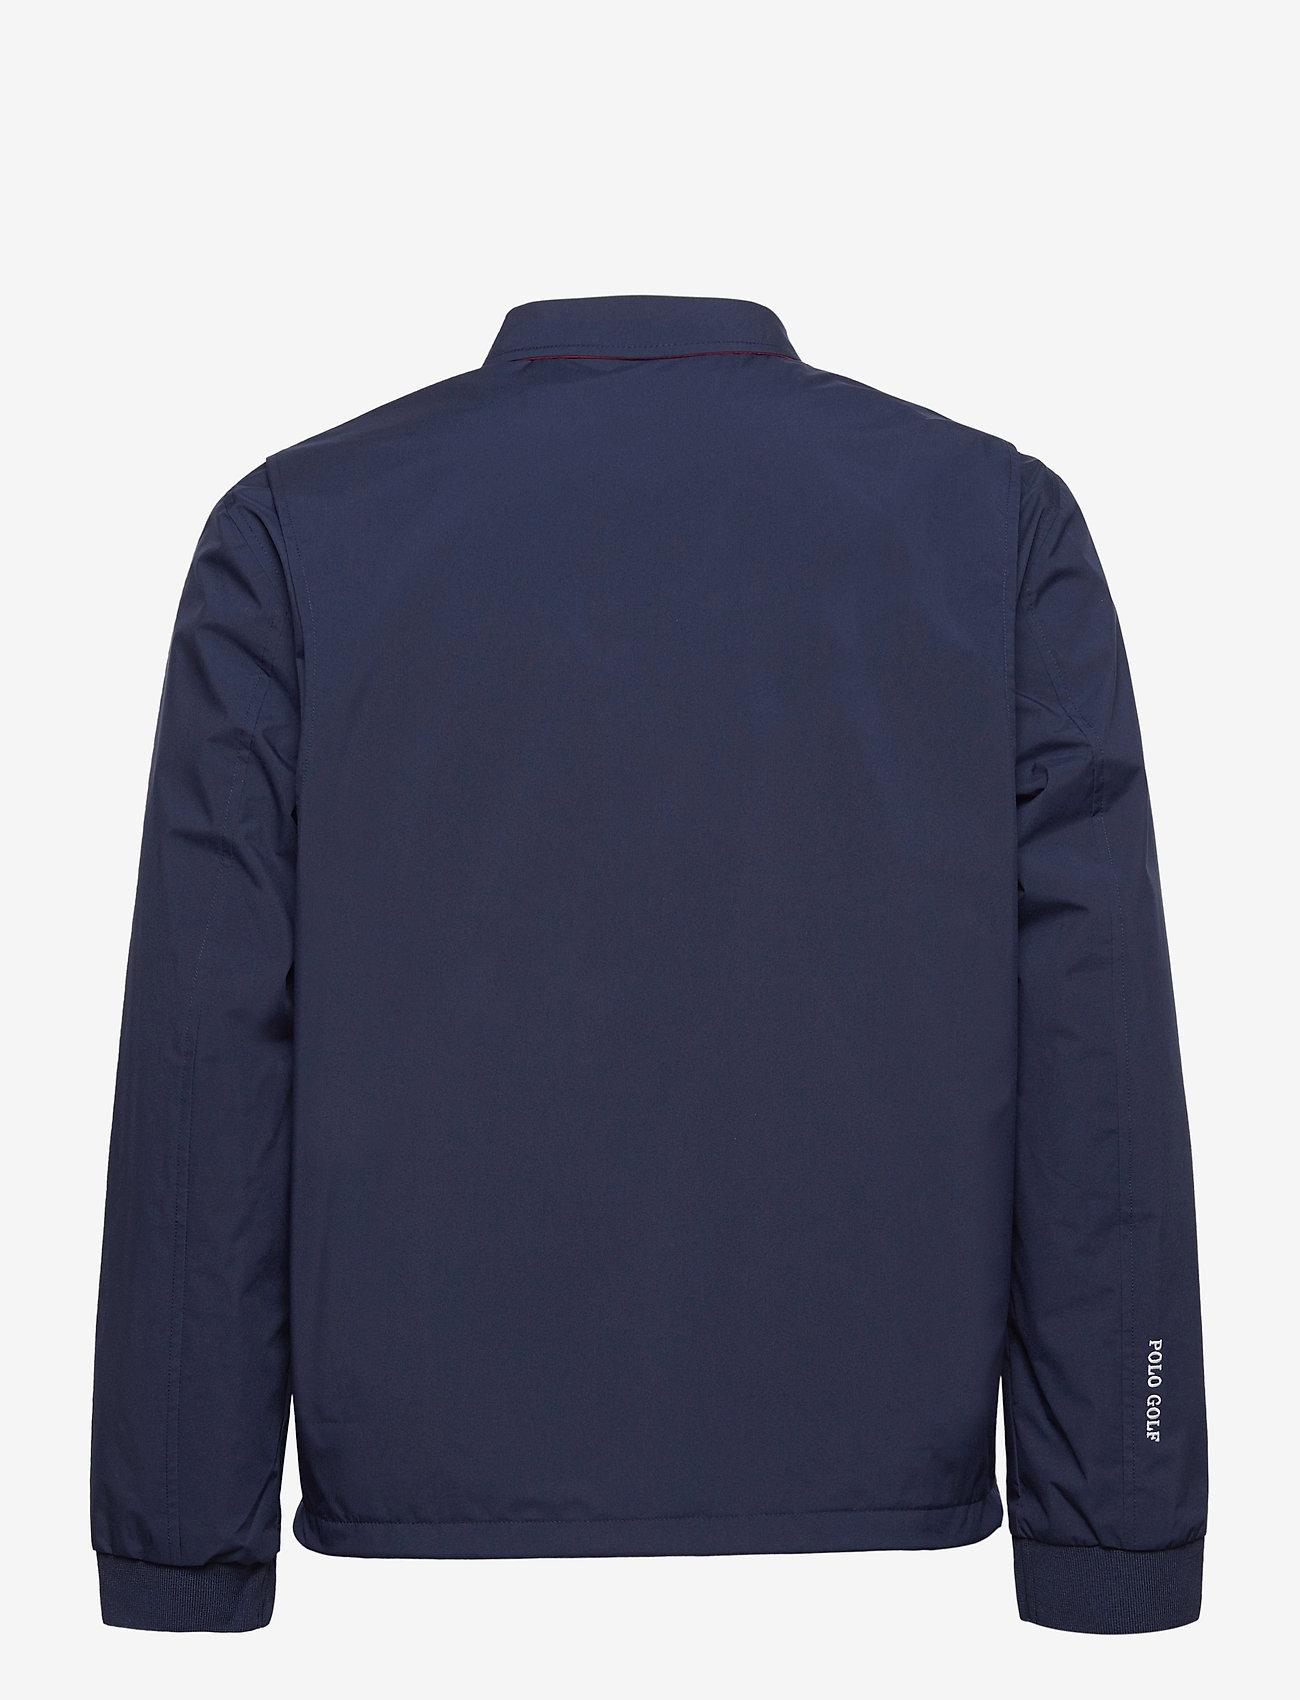 Ralph Lauren Golf - PERFRMNCE STRTCH 2L-BI-SWING JACKT - golf jackets - french navy - 1